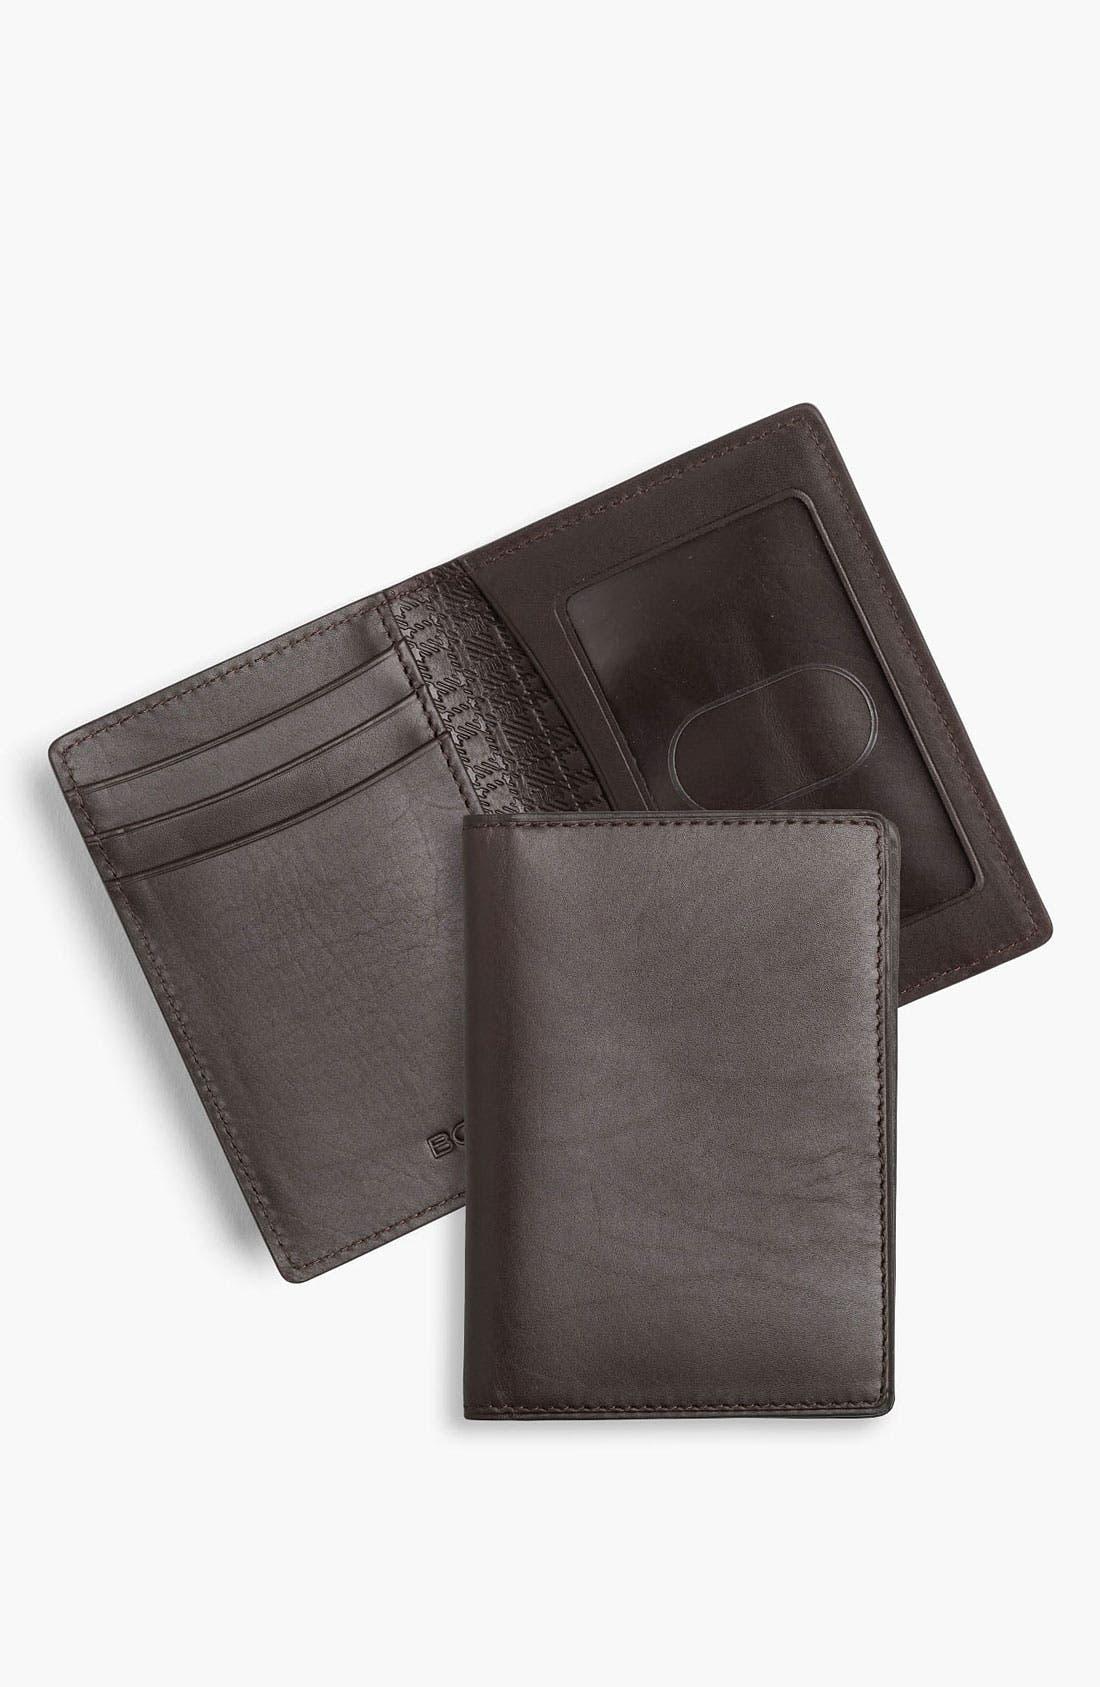 Main Image - Boconi 'Xavier' Card Case